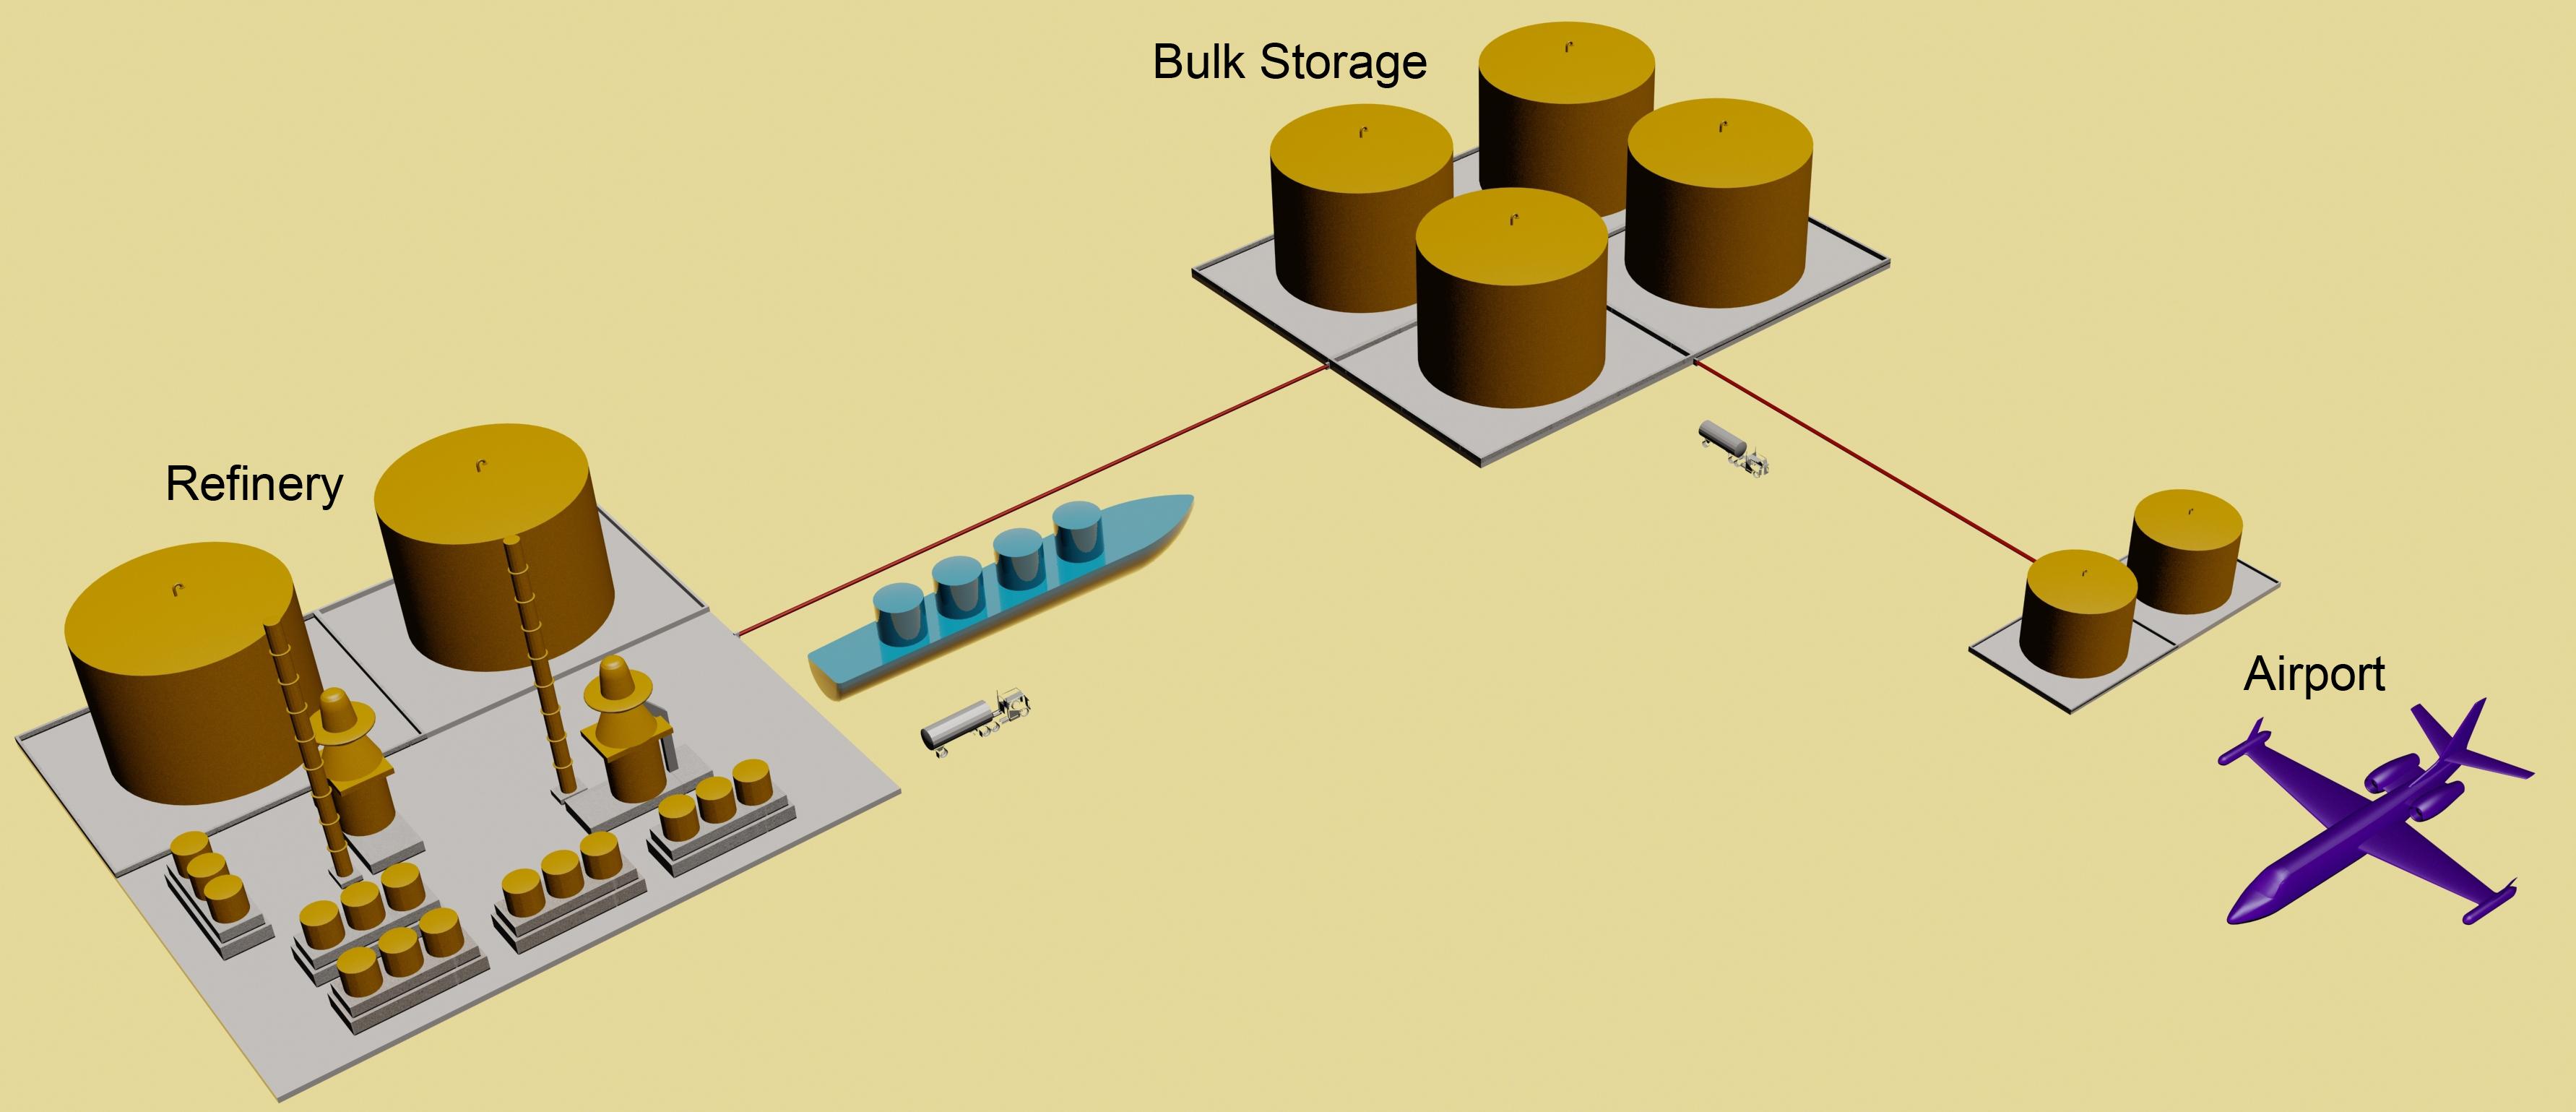 Jet fuel storage photo